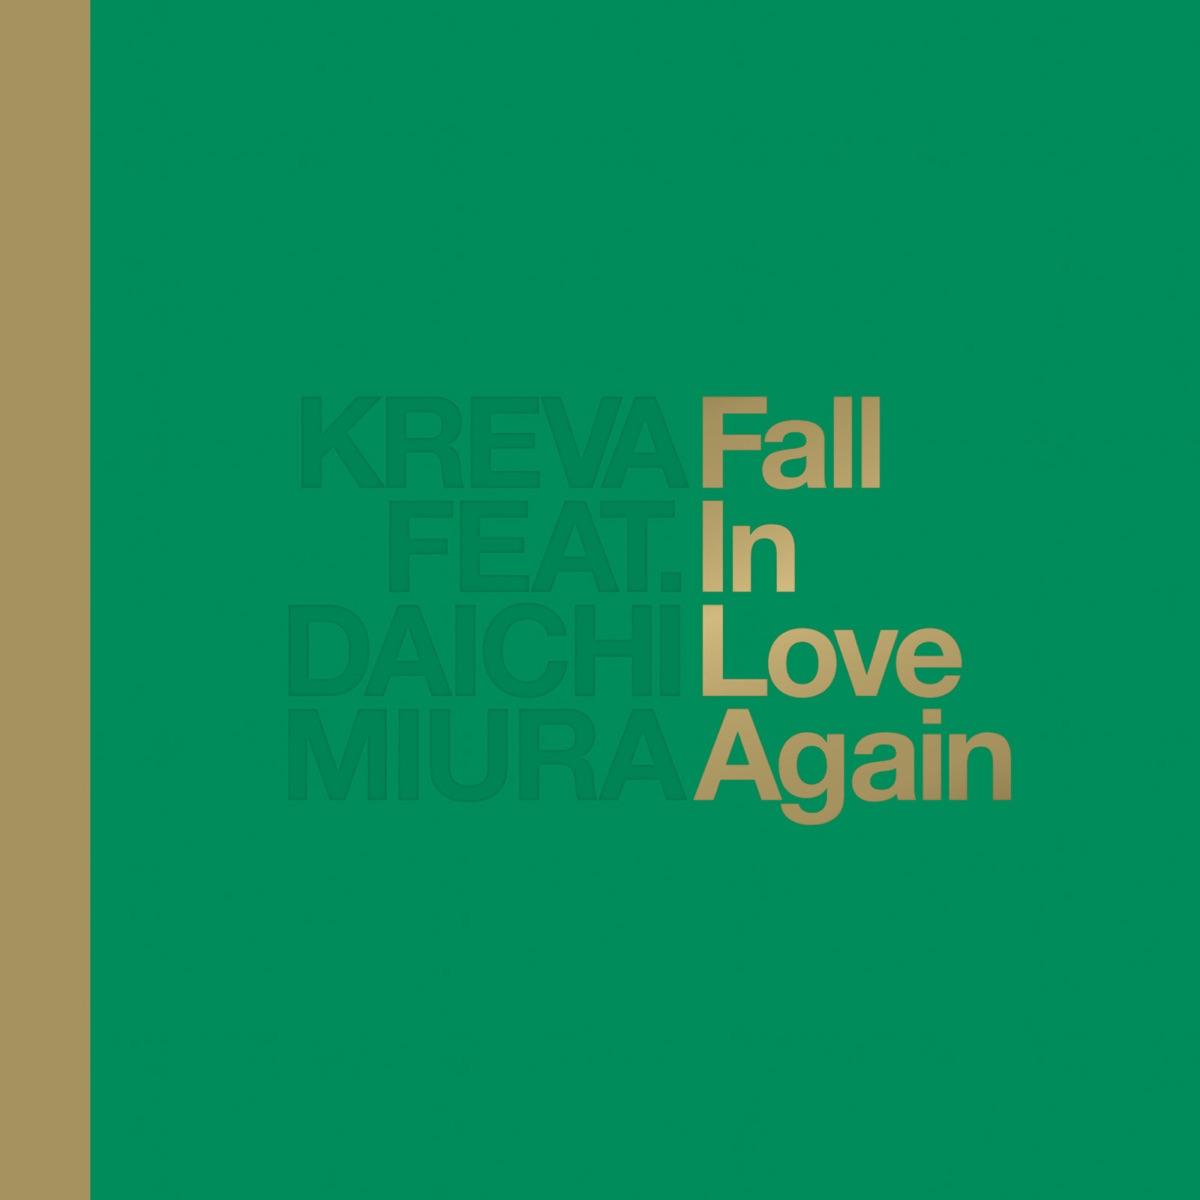 『KREVA - Fall in Love Again feat. 三浦大知 歌詞』収録の『Fall in Love Again feat. 三浦大知』ジャケット